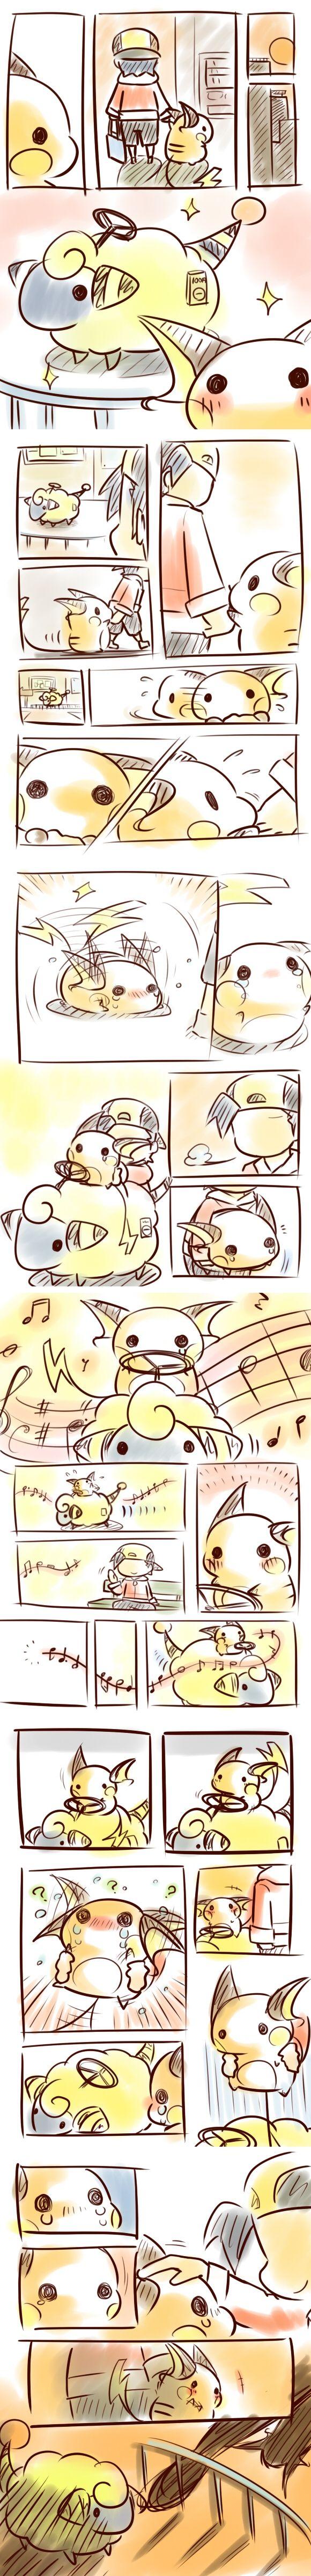 Pixiv Id 3414789, Nintendo, Pokémon, Hibiki (Pokémon), Raichu, Mareep